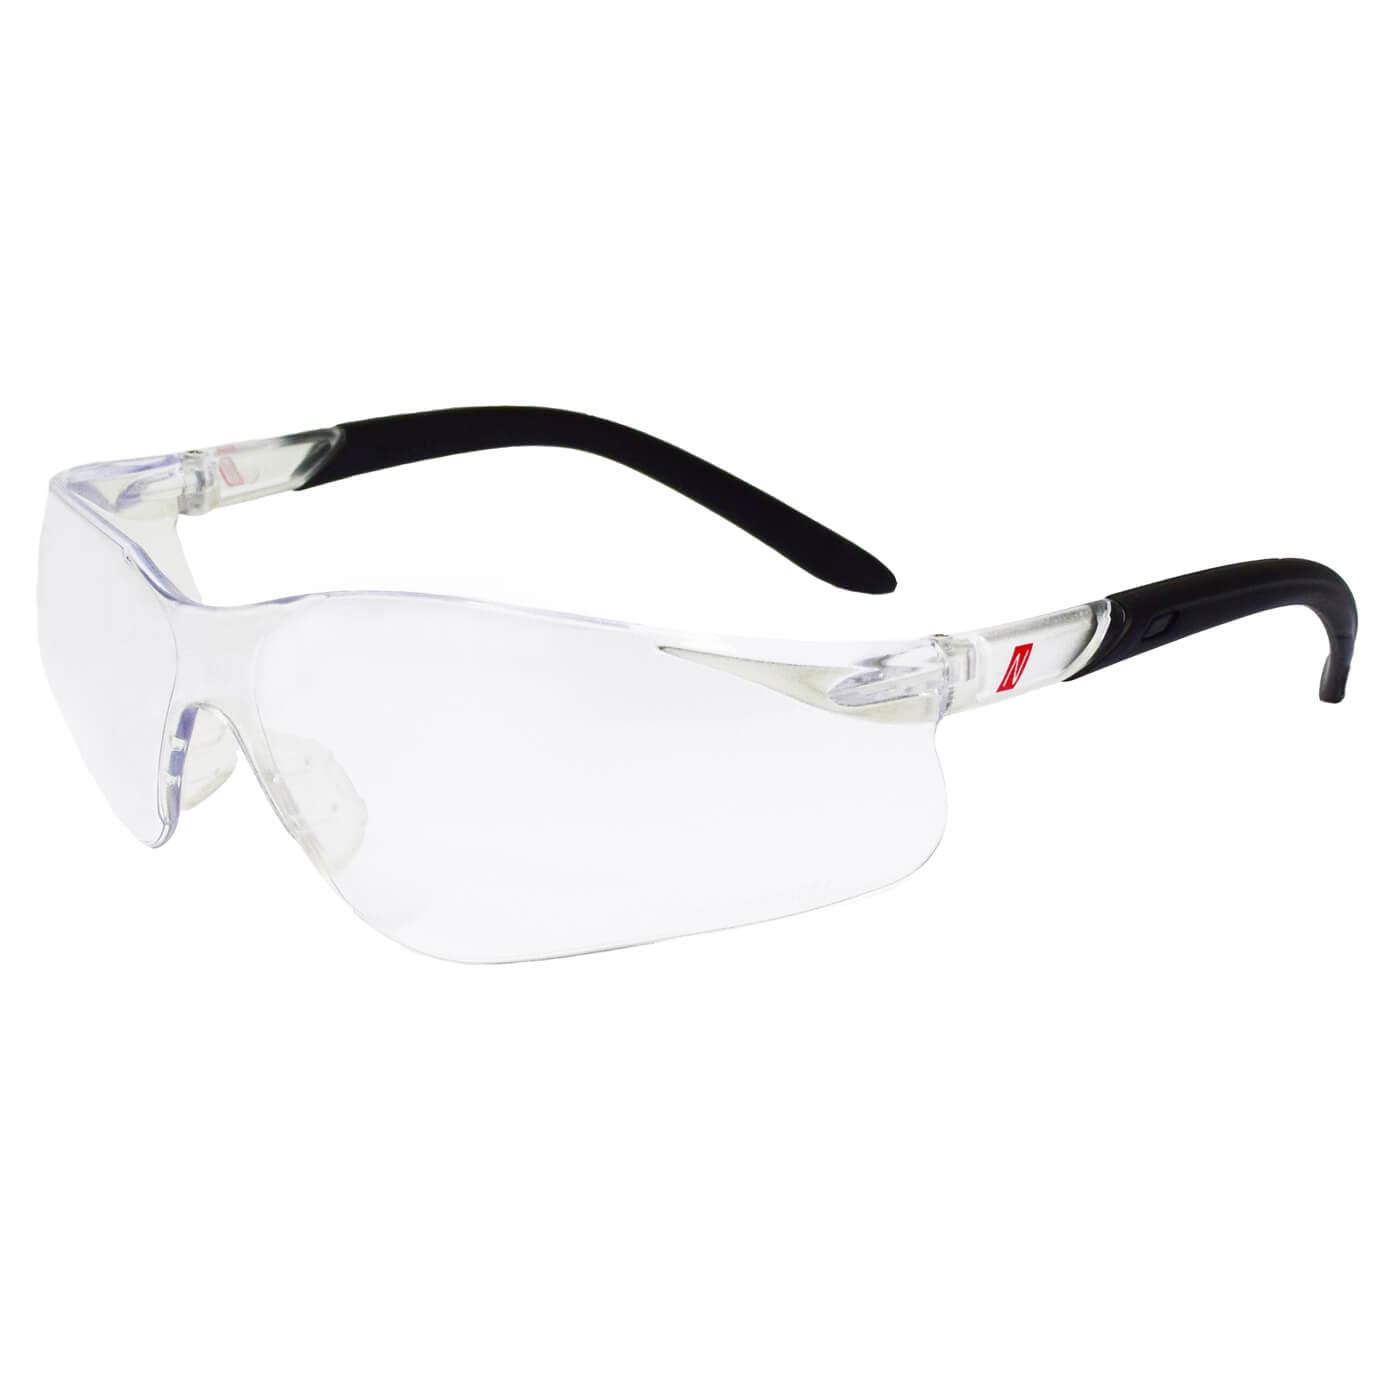 Okulary ochronne Nitras Vision Protect 9010